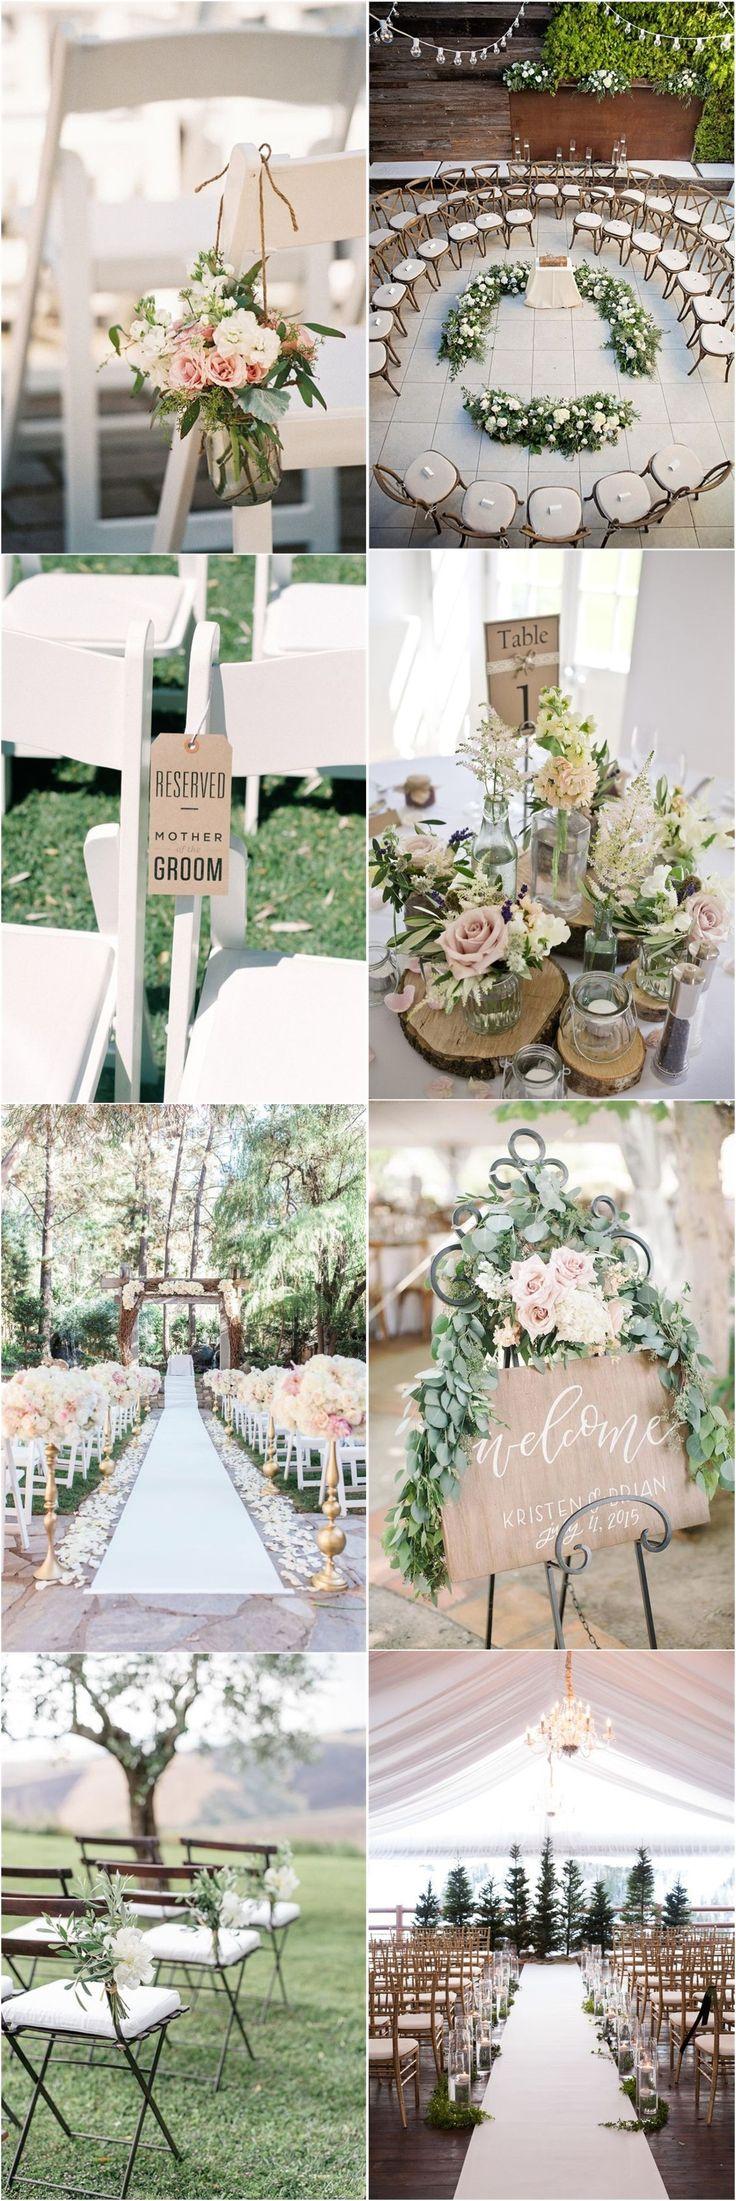 25+ Best Ideas About Outdoor Wedding Ceremonies On